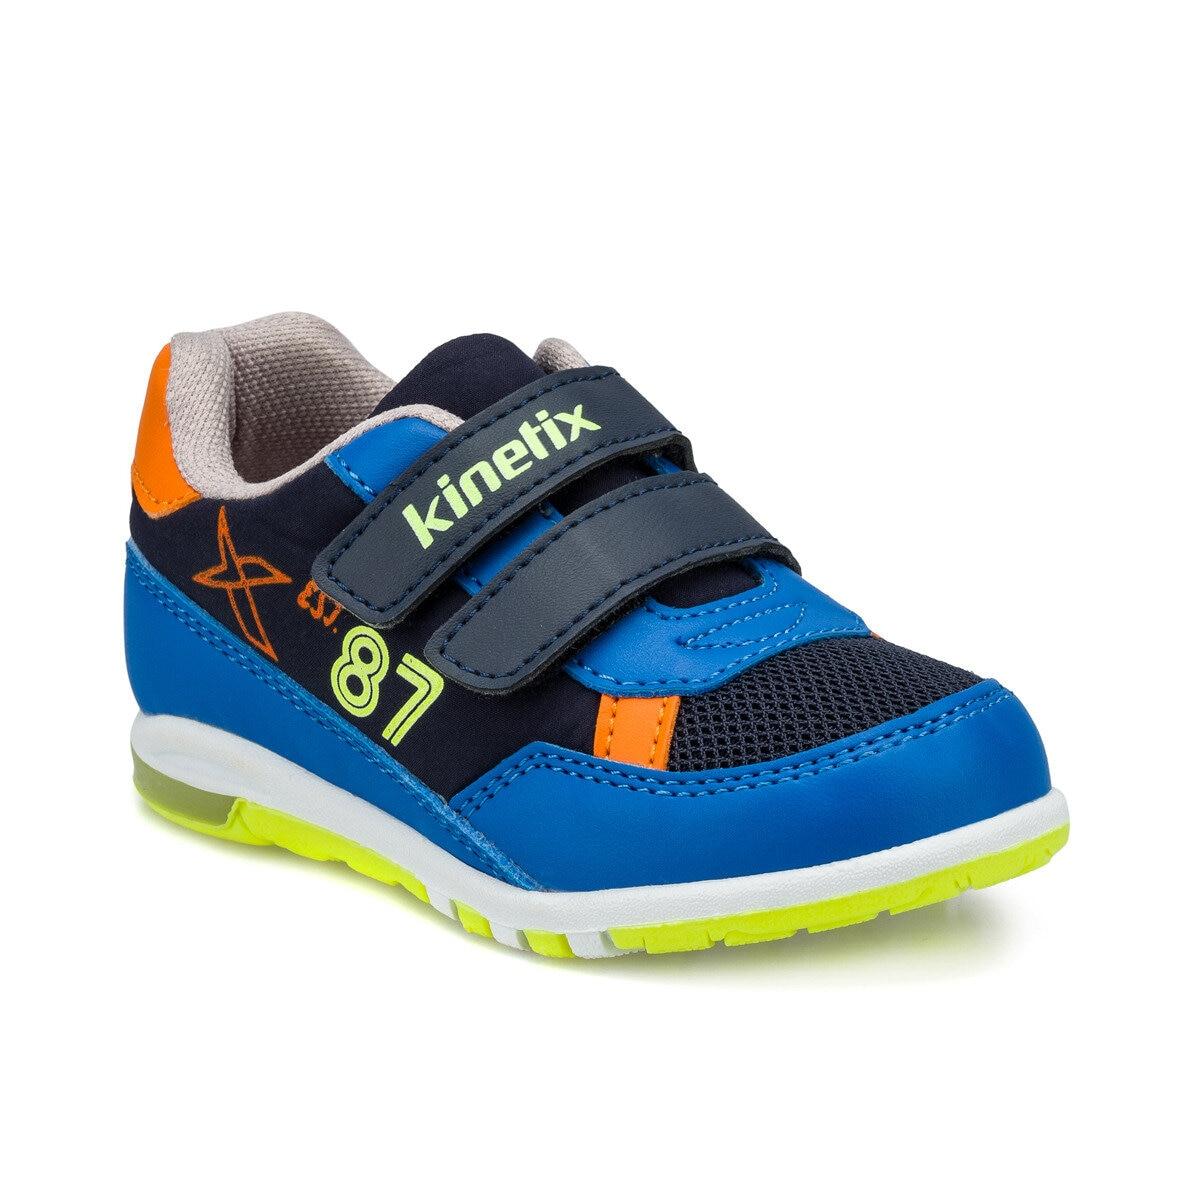 FLO MELSI Saks Male Child Sneaker Shoes KINETIX